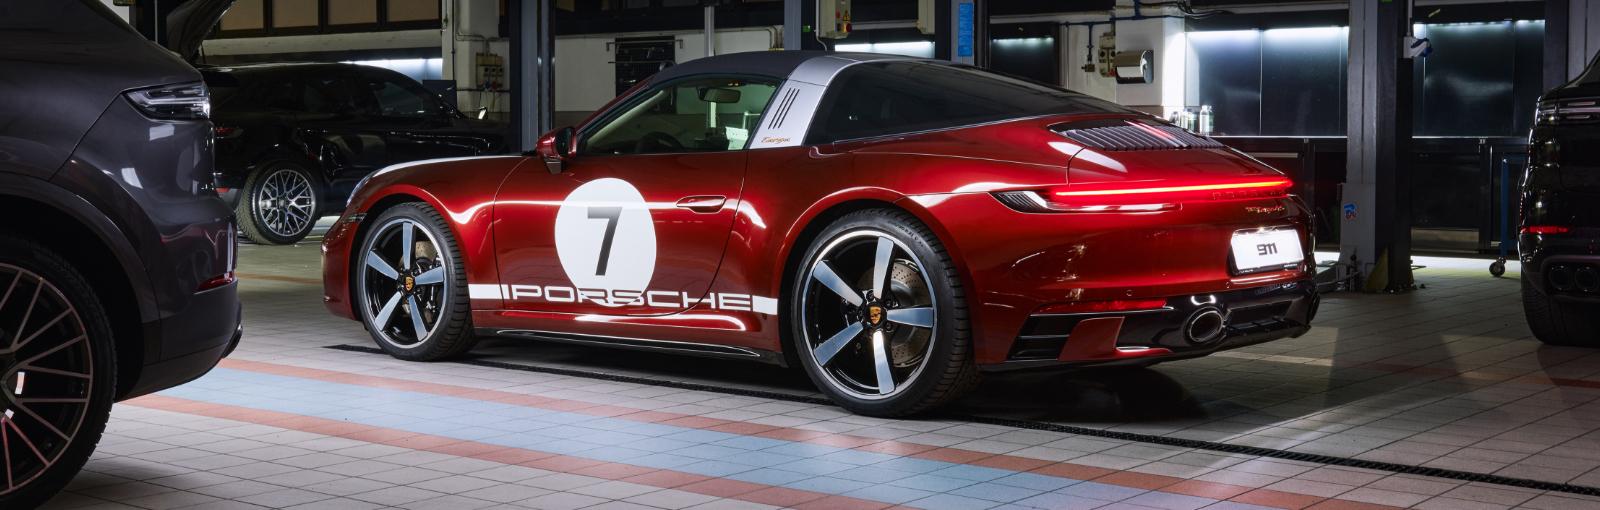 La nuova 911 Targa 4S Heritage Design Edition